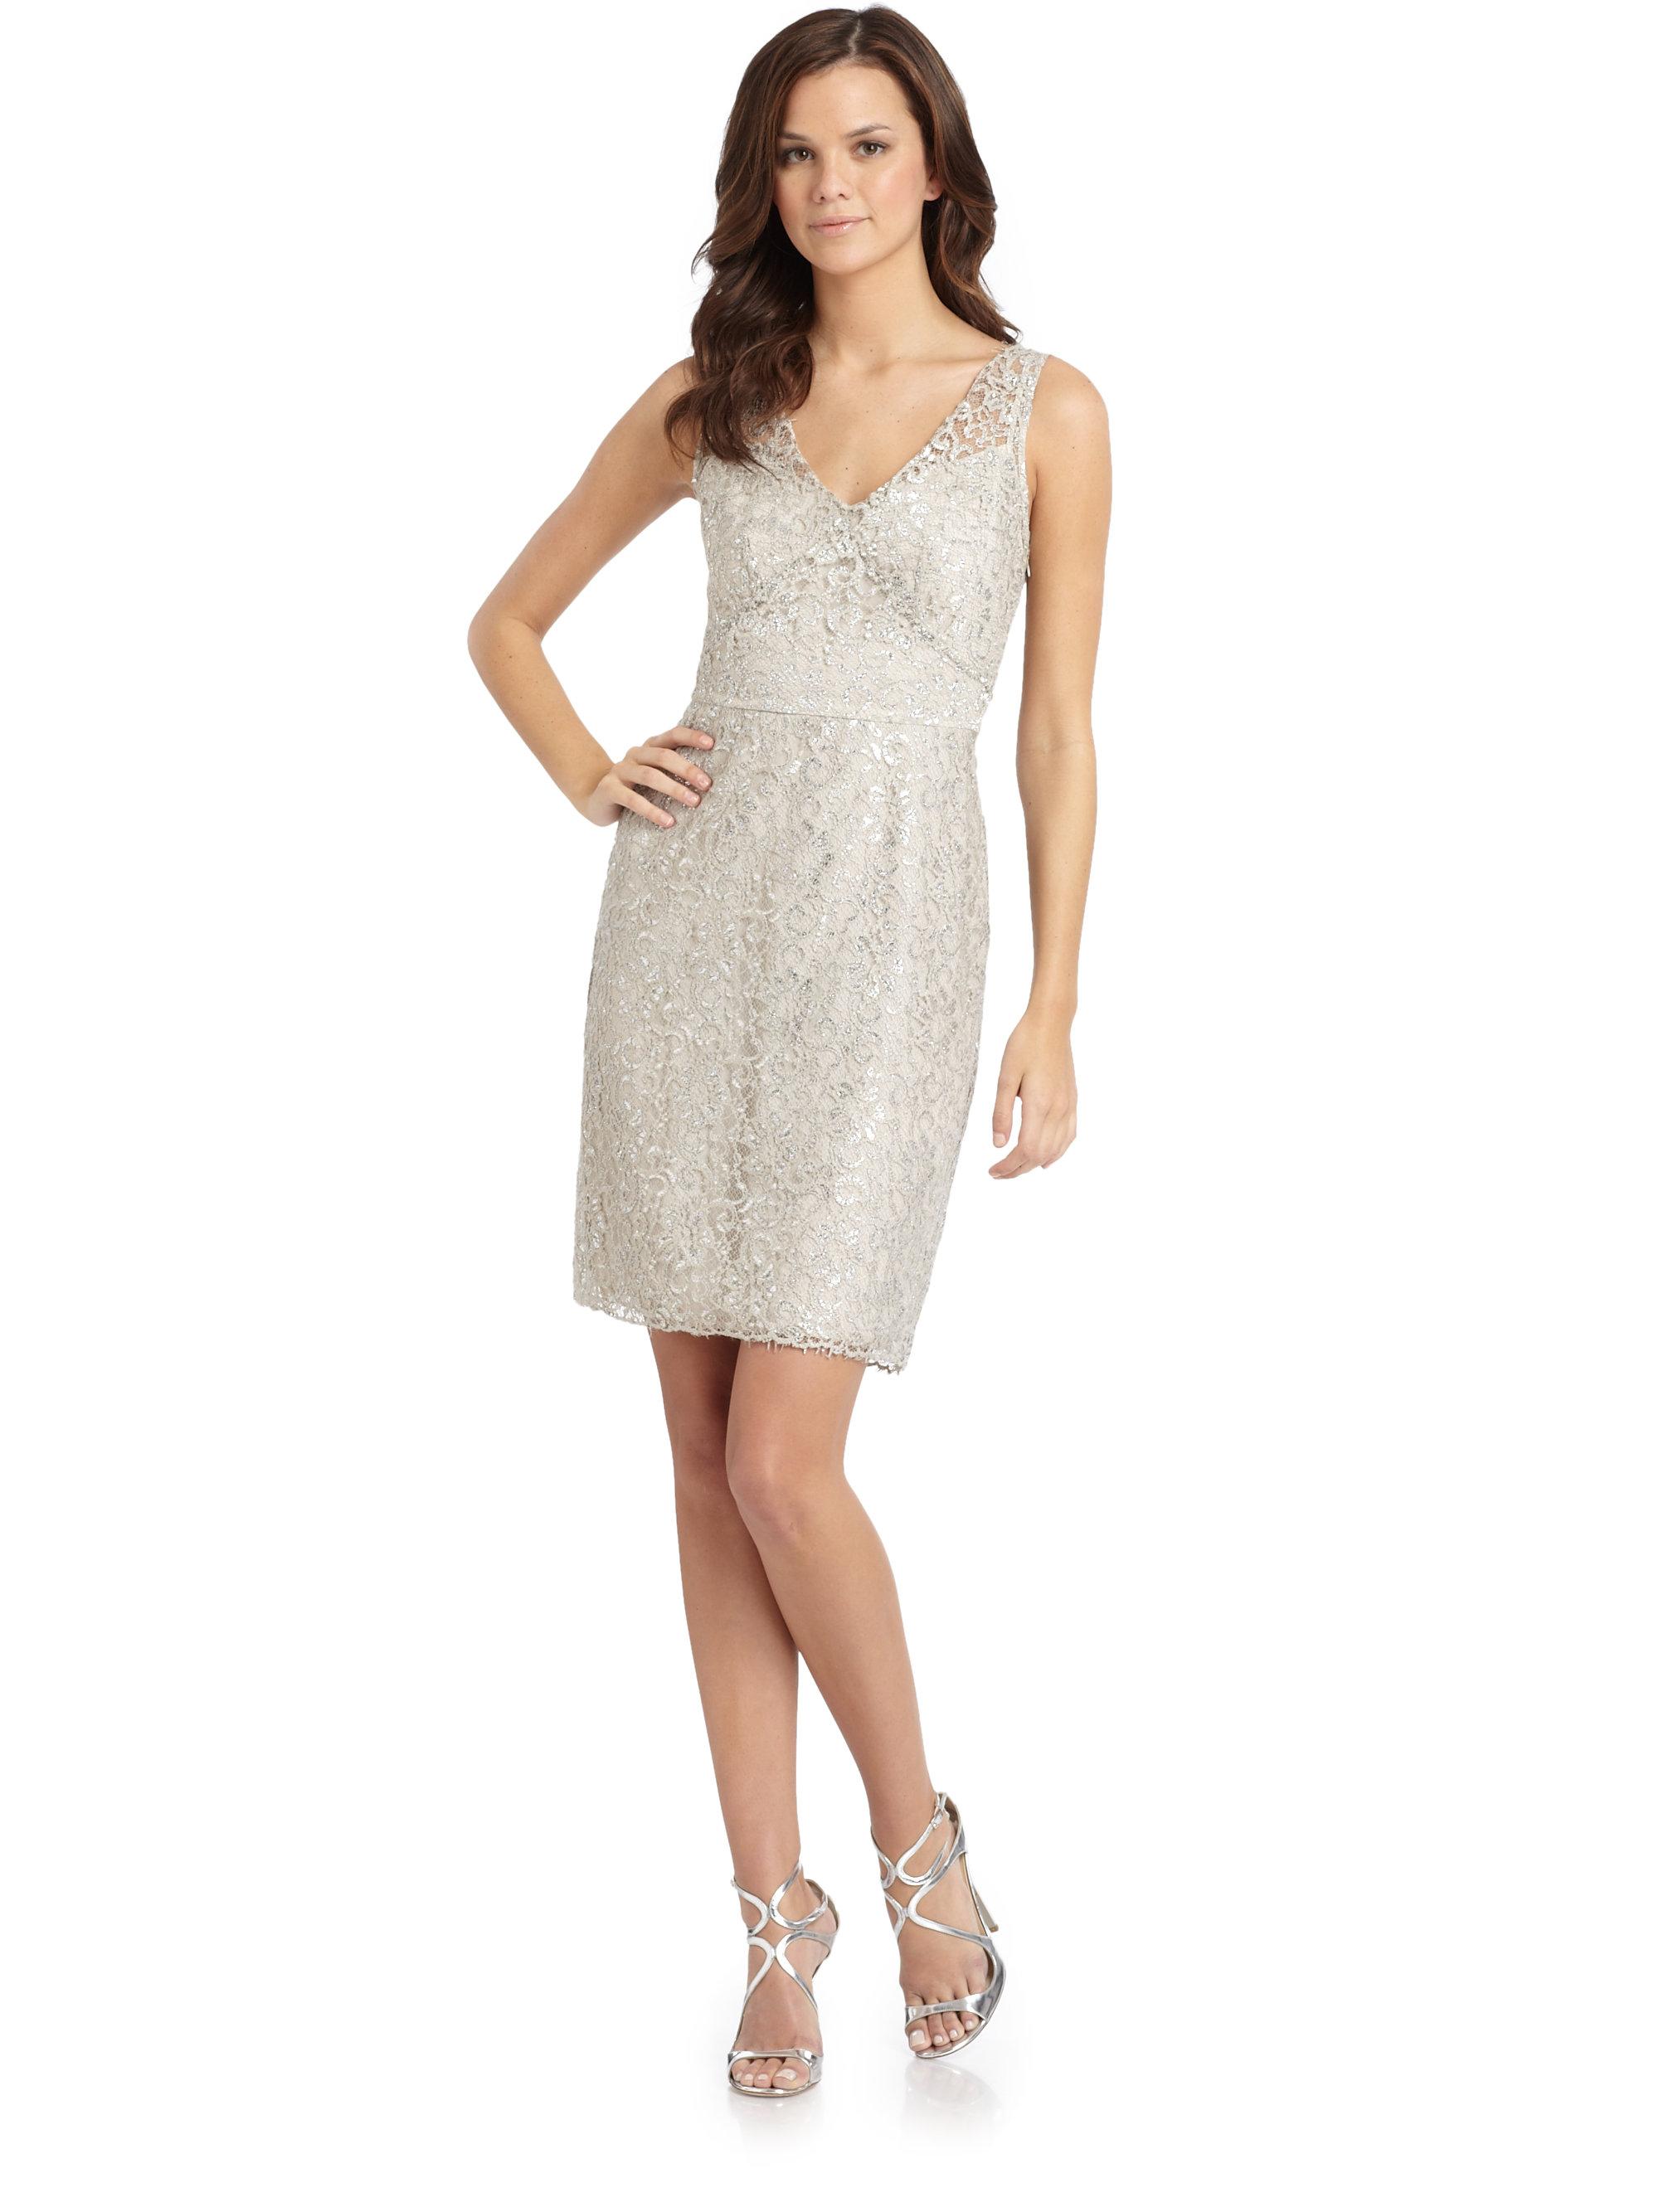 5c49b4104113 Lyst - BCBGMAXAZRIA Floral Lace Dress in Metallic